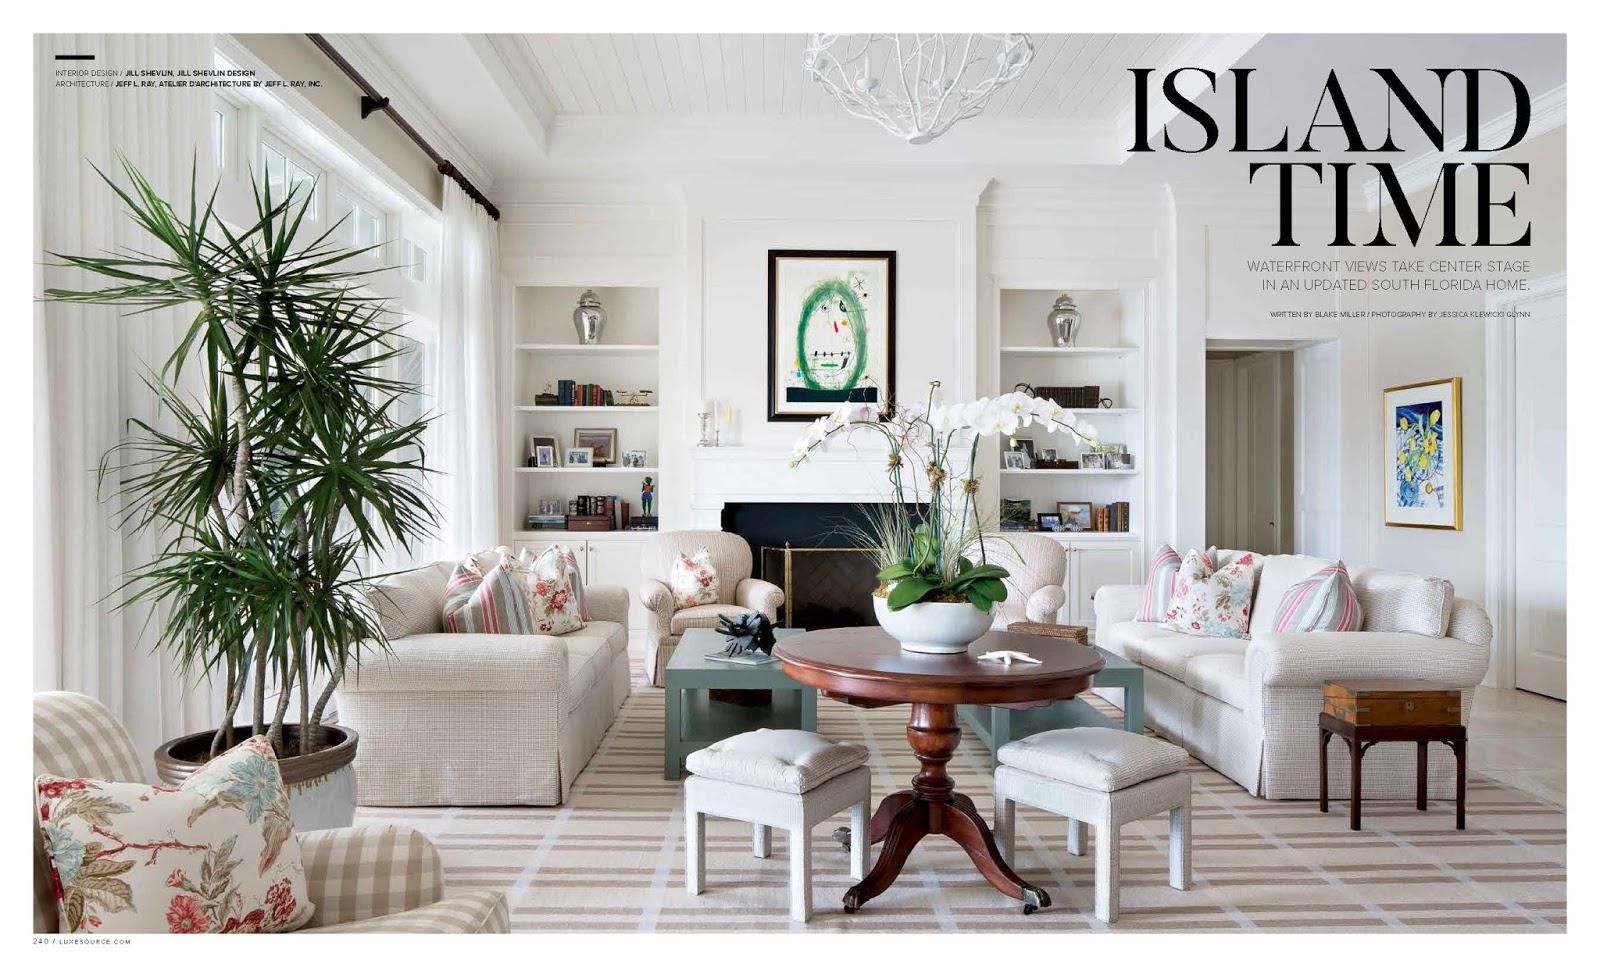 Jessica Klewicki Glynn | Interior Design Photographer